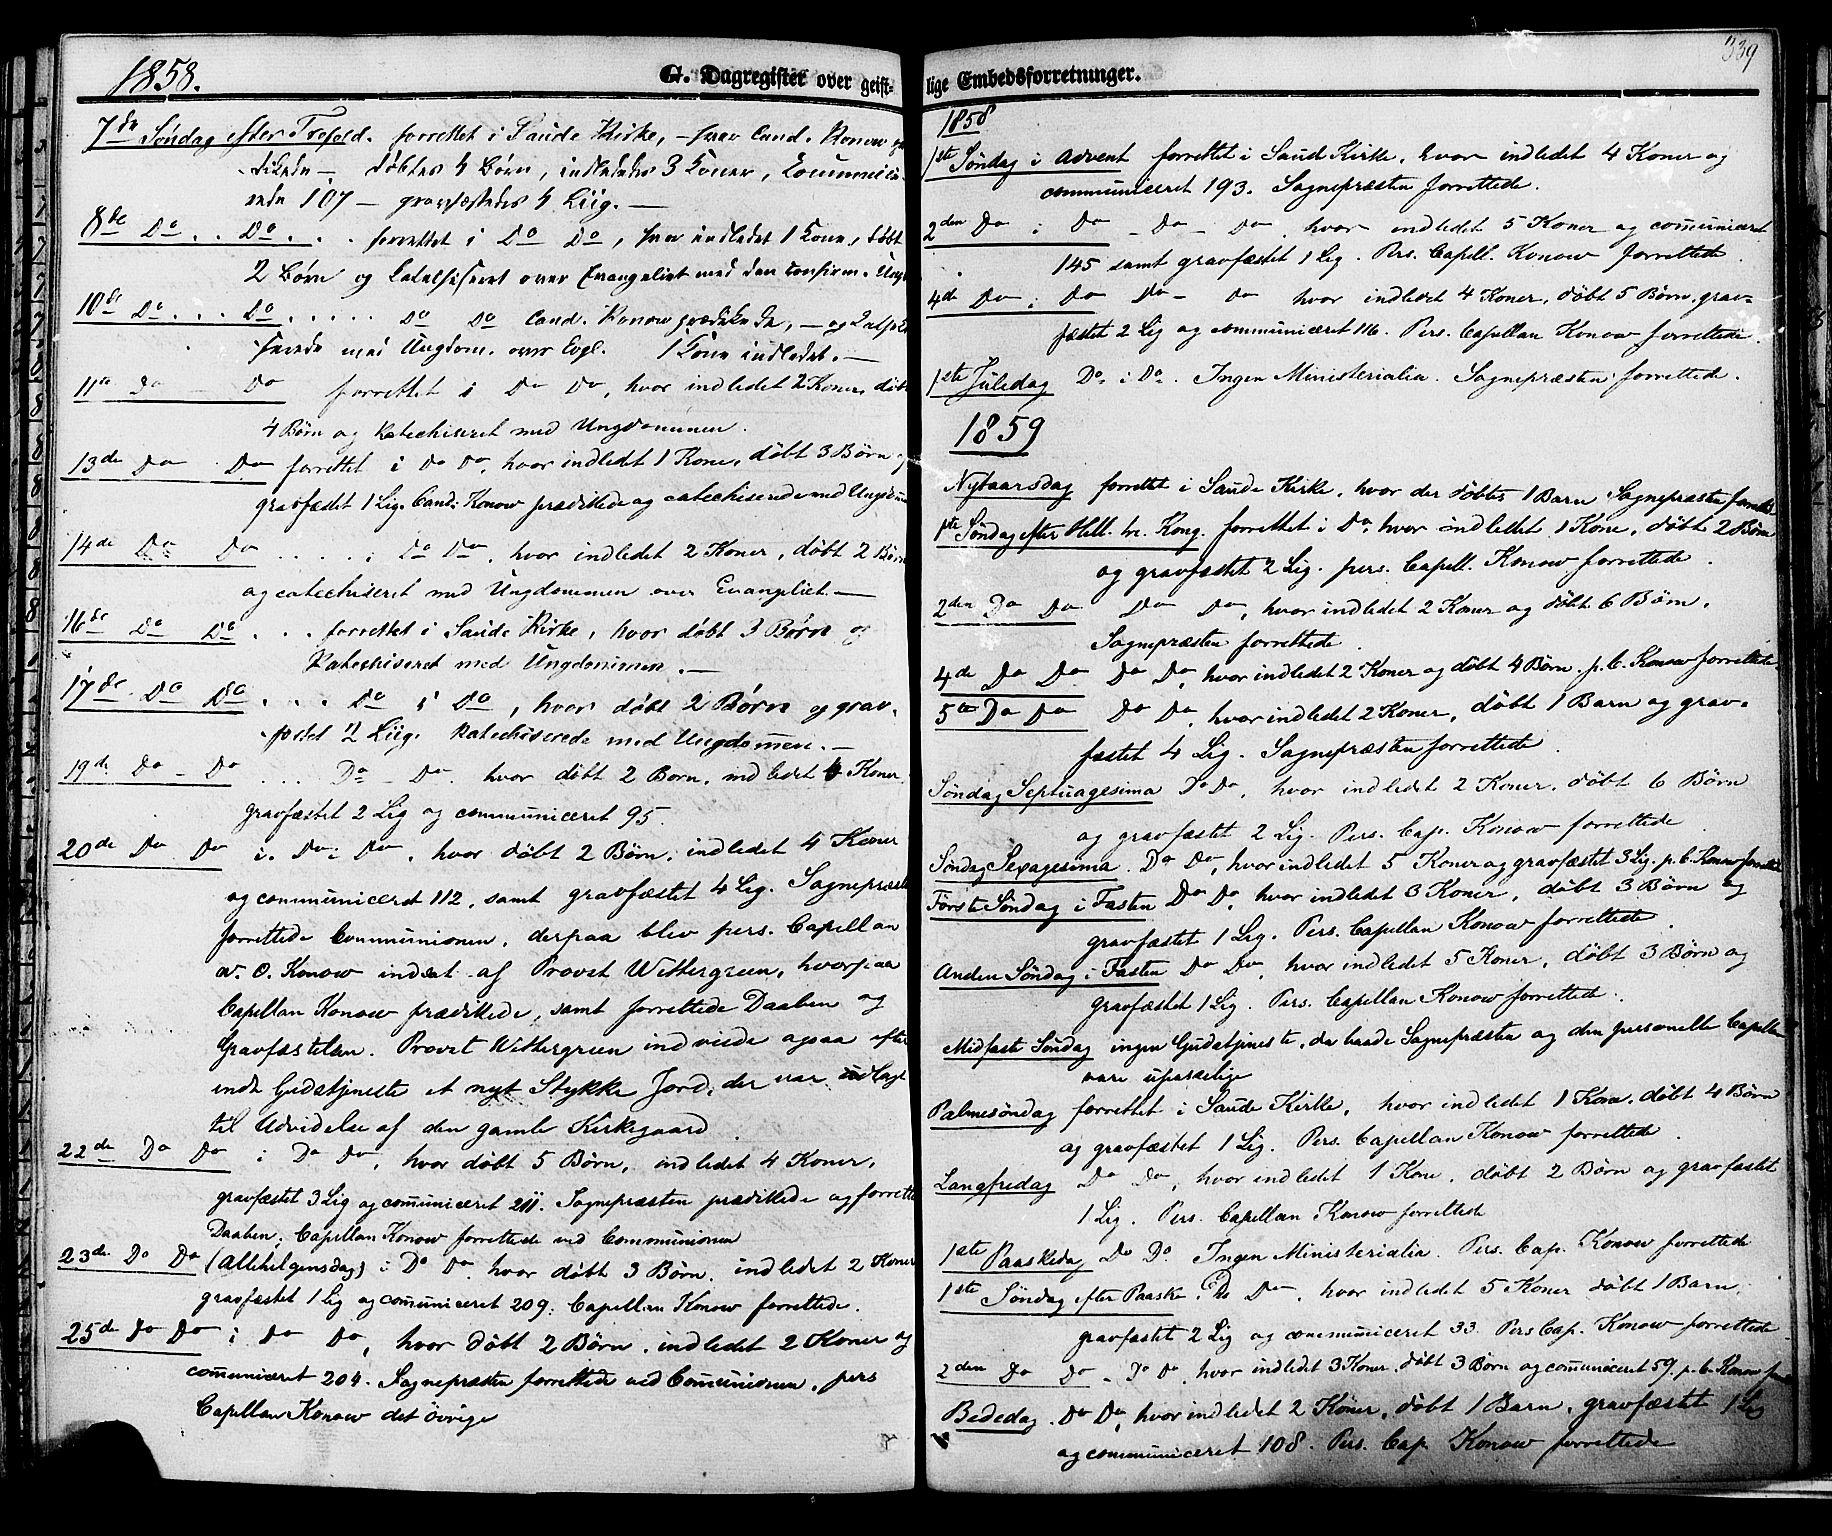 SAKO, Sauherad kirkebøker, F/Fa/L0007: Ministerialbok nr. I 7, 1851-1873, s. 339